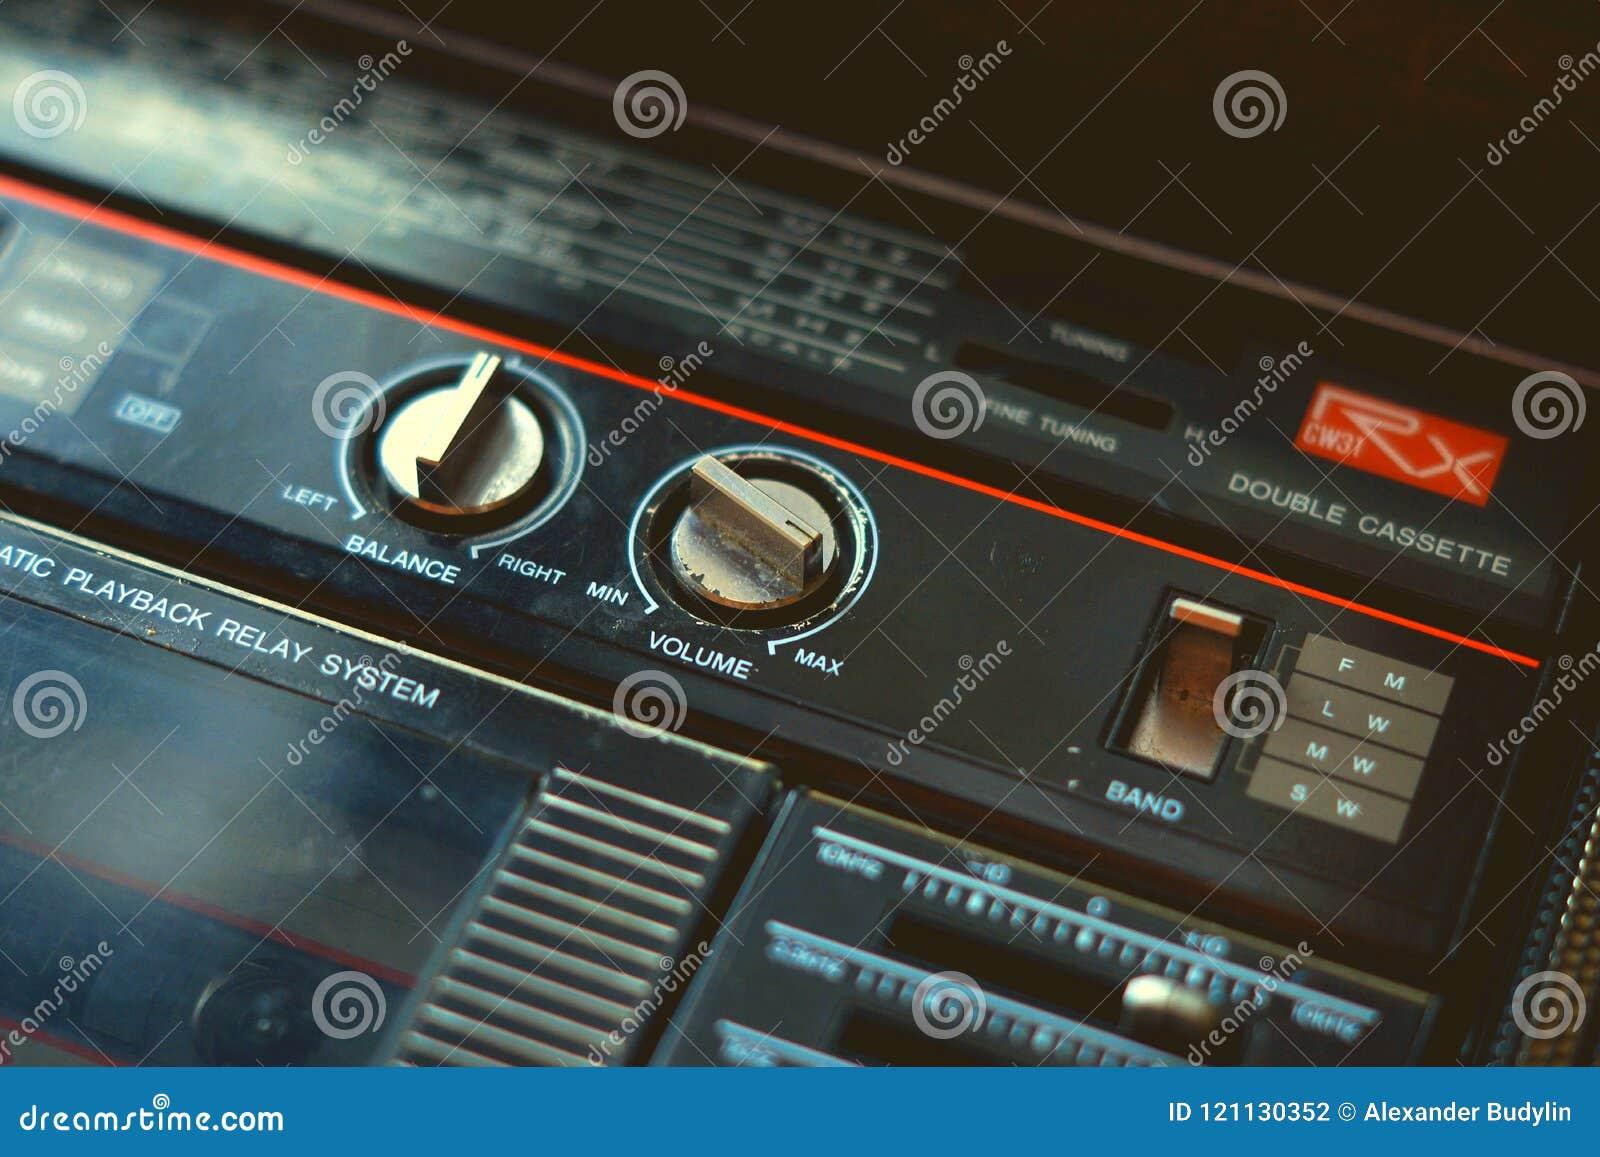 Music cassette player